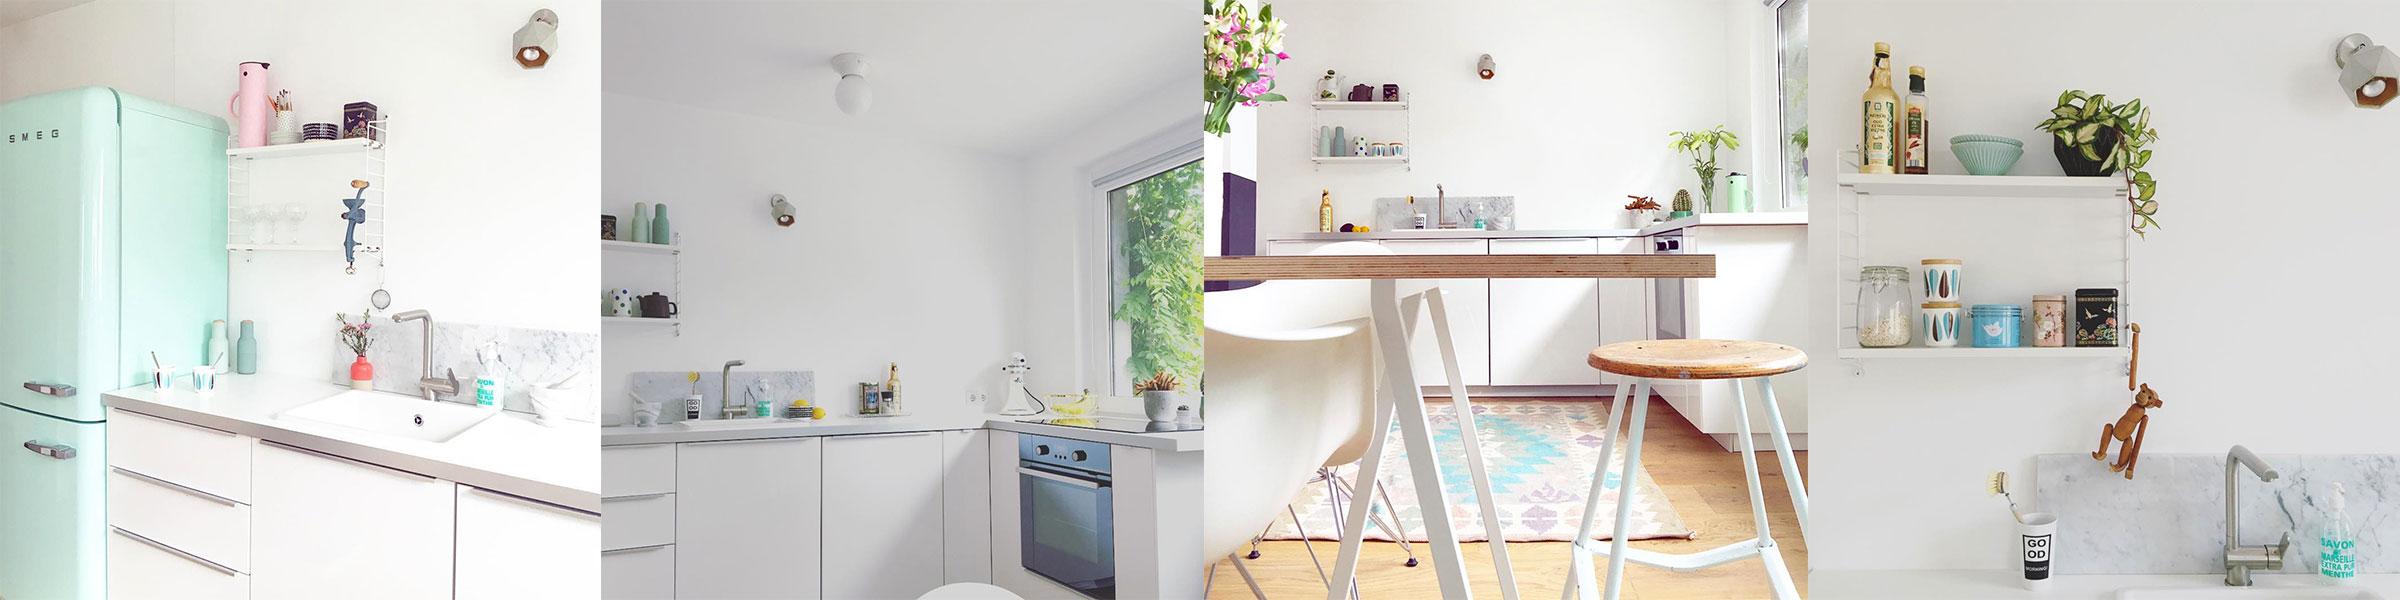 k chenideen 2017. Black Bedroom Furniture Sets. Home Design Ideas